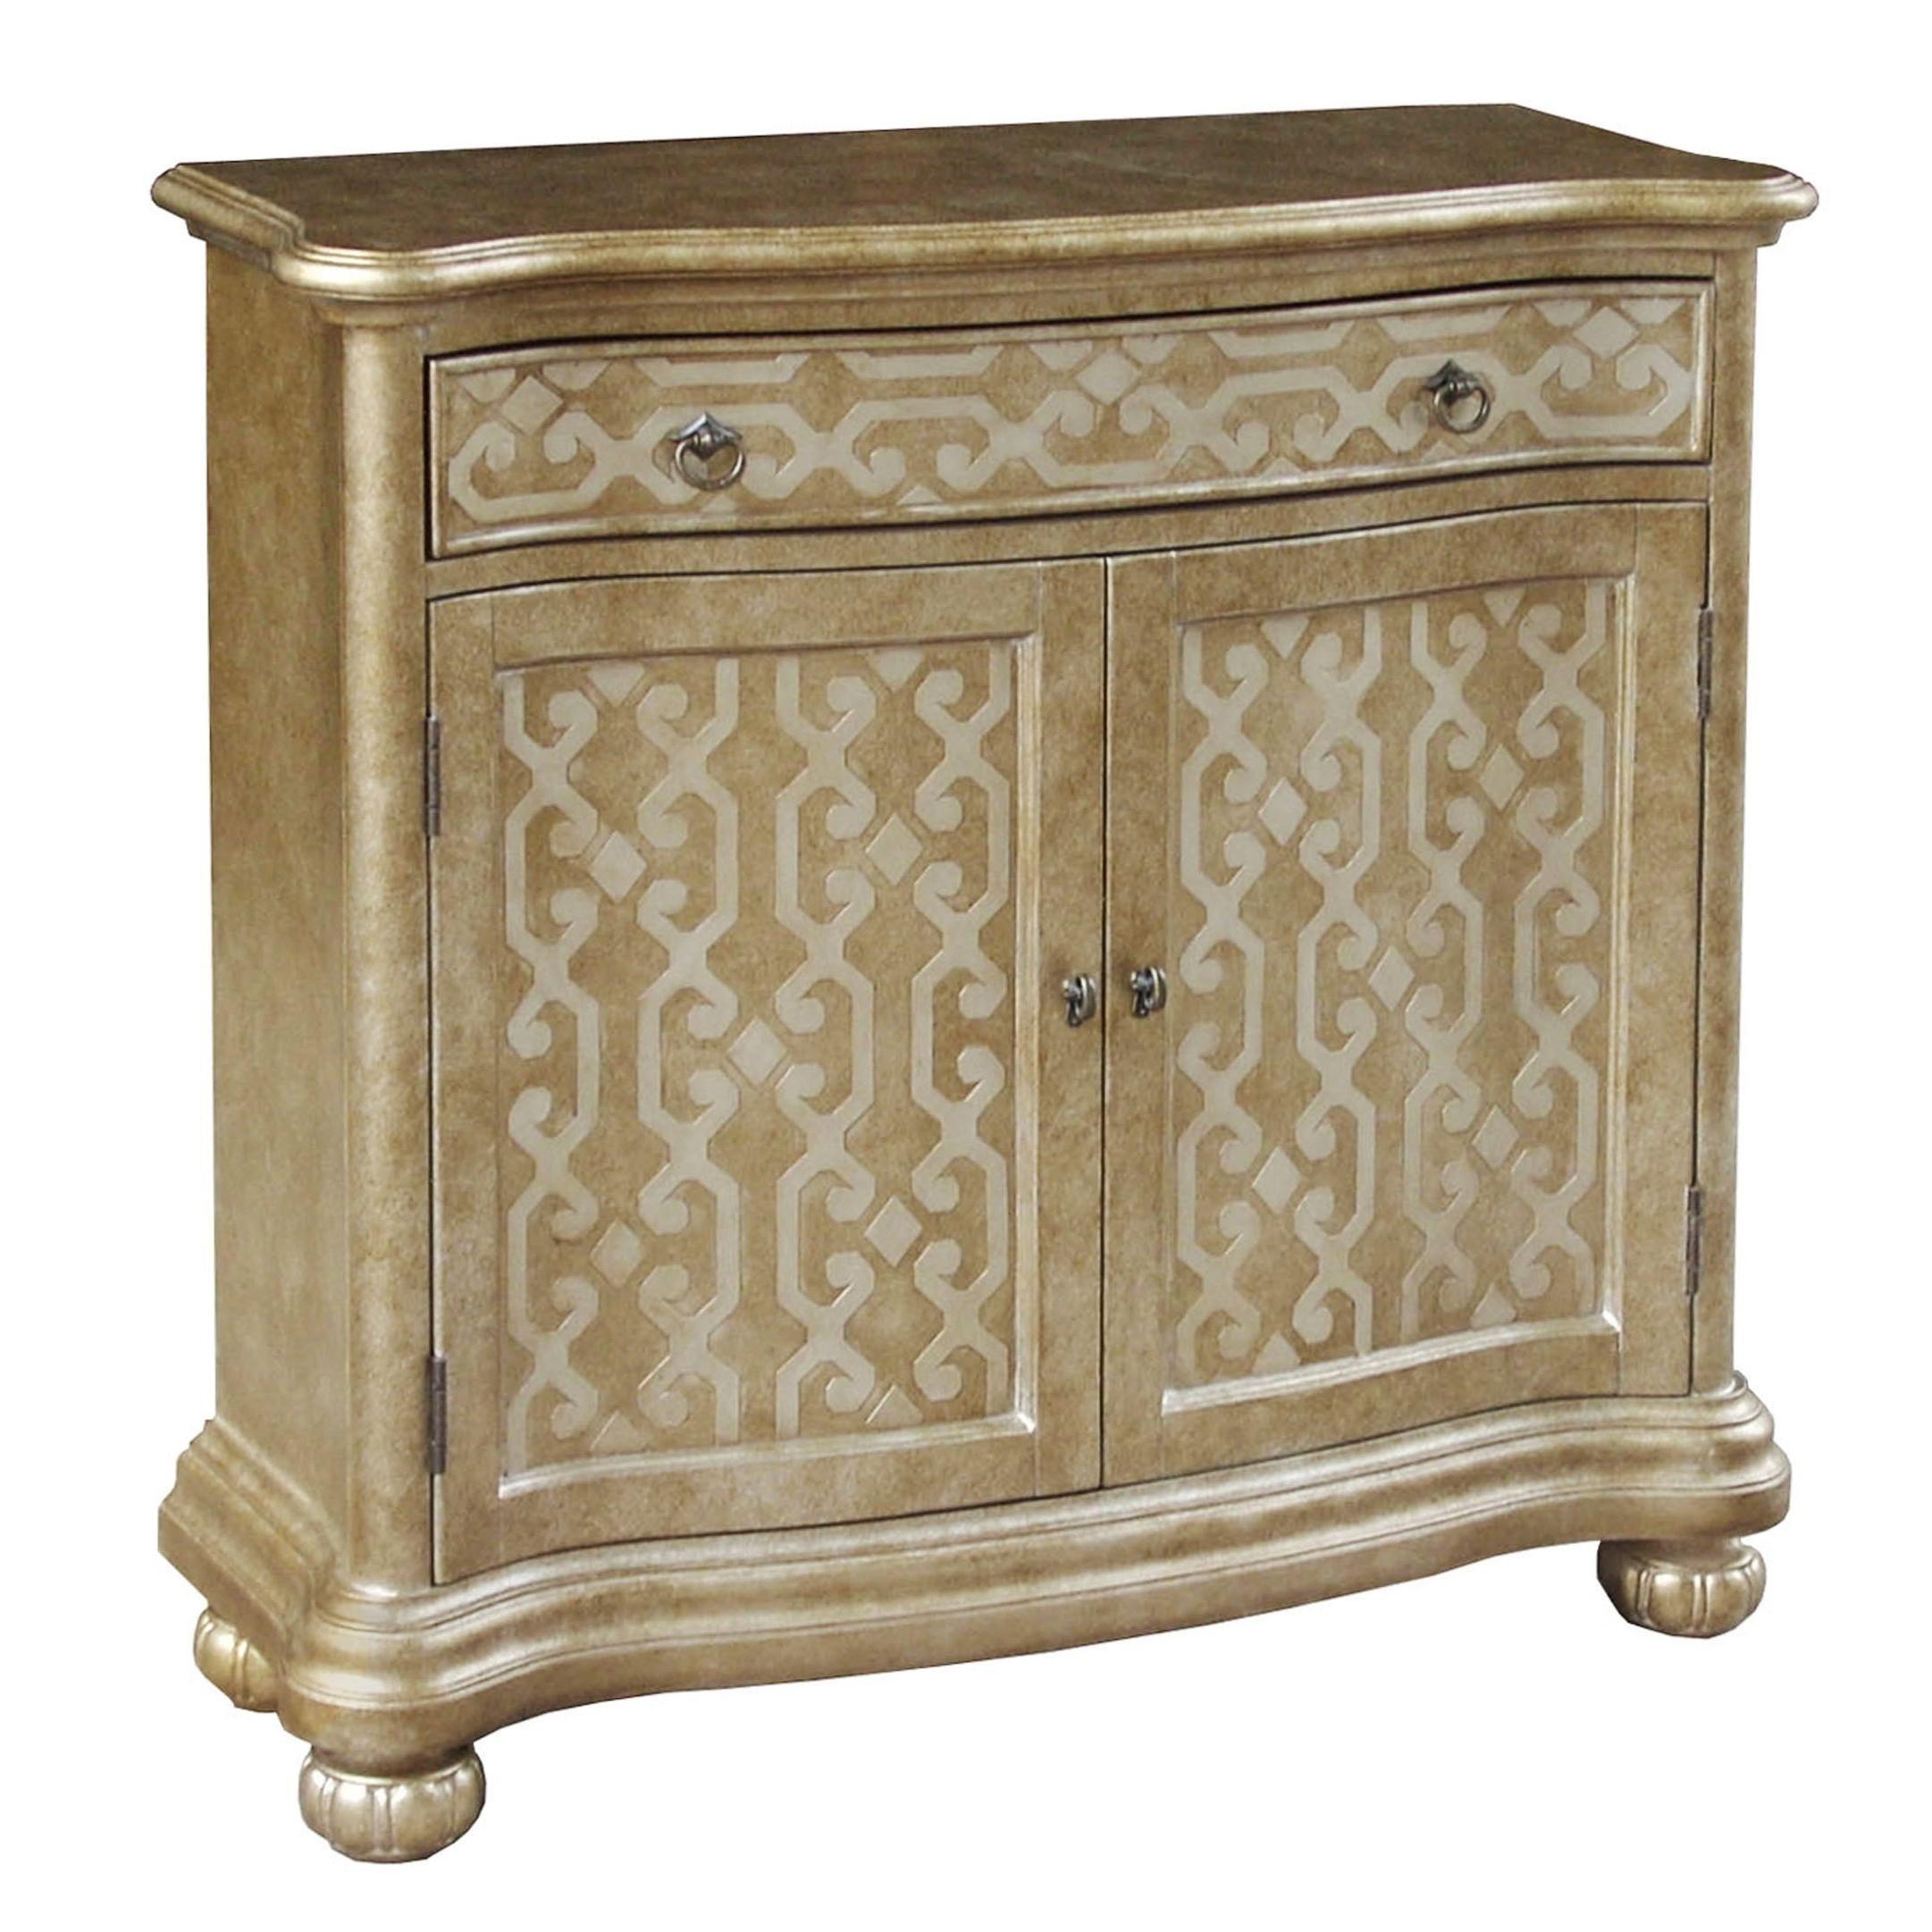 accent two one mullis white coyne cabinets rosendale tempered target cabinet gray furniture diondre sidell pulaski bayside barn ashley glass door astoria kattie mirimyn kara